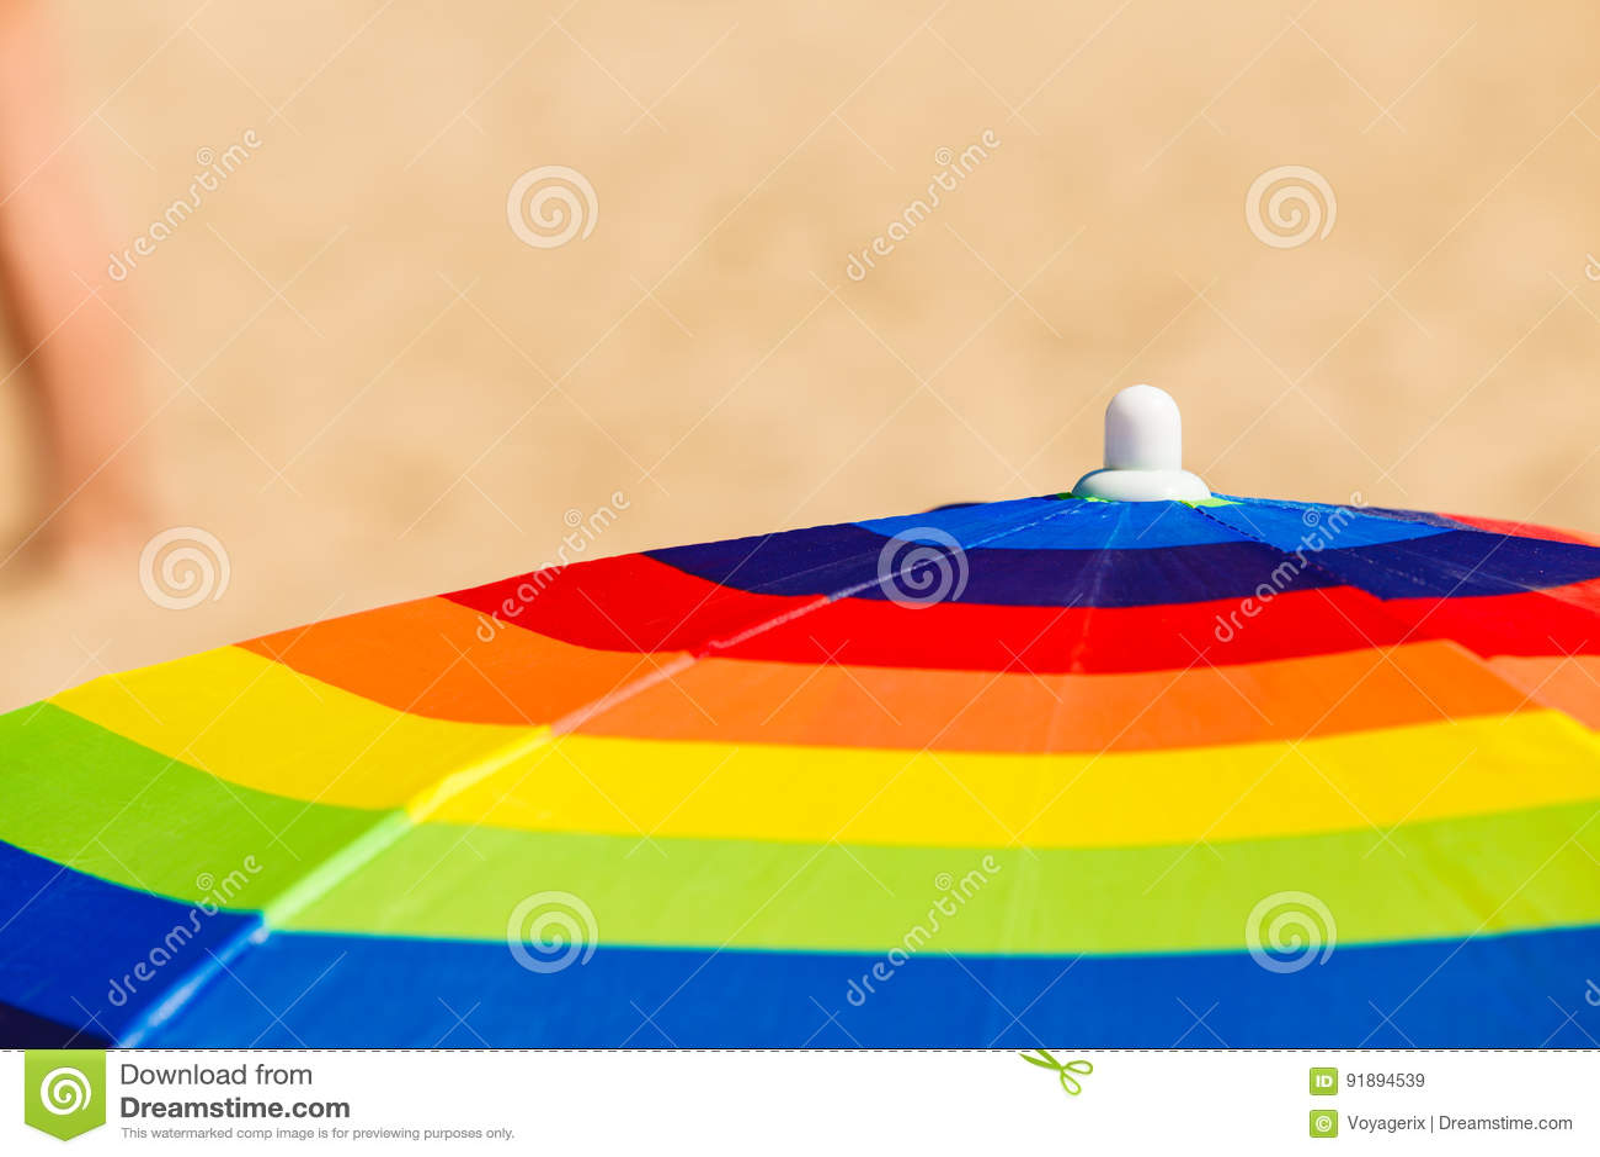 Colorful summer umbrella parasol during summertime